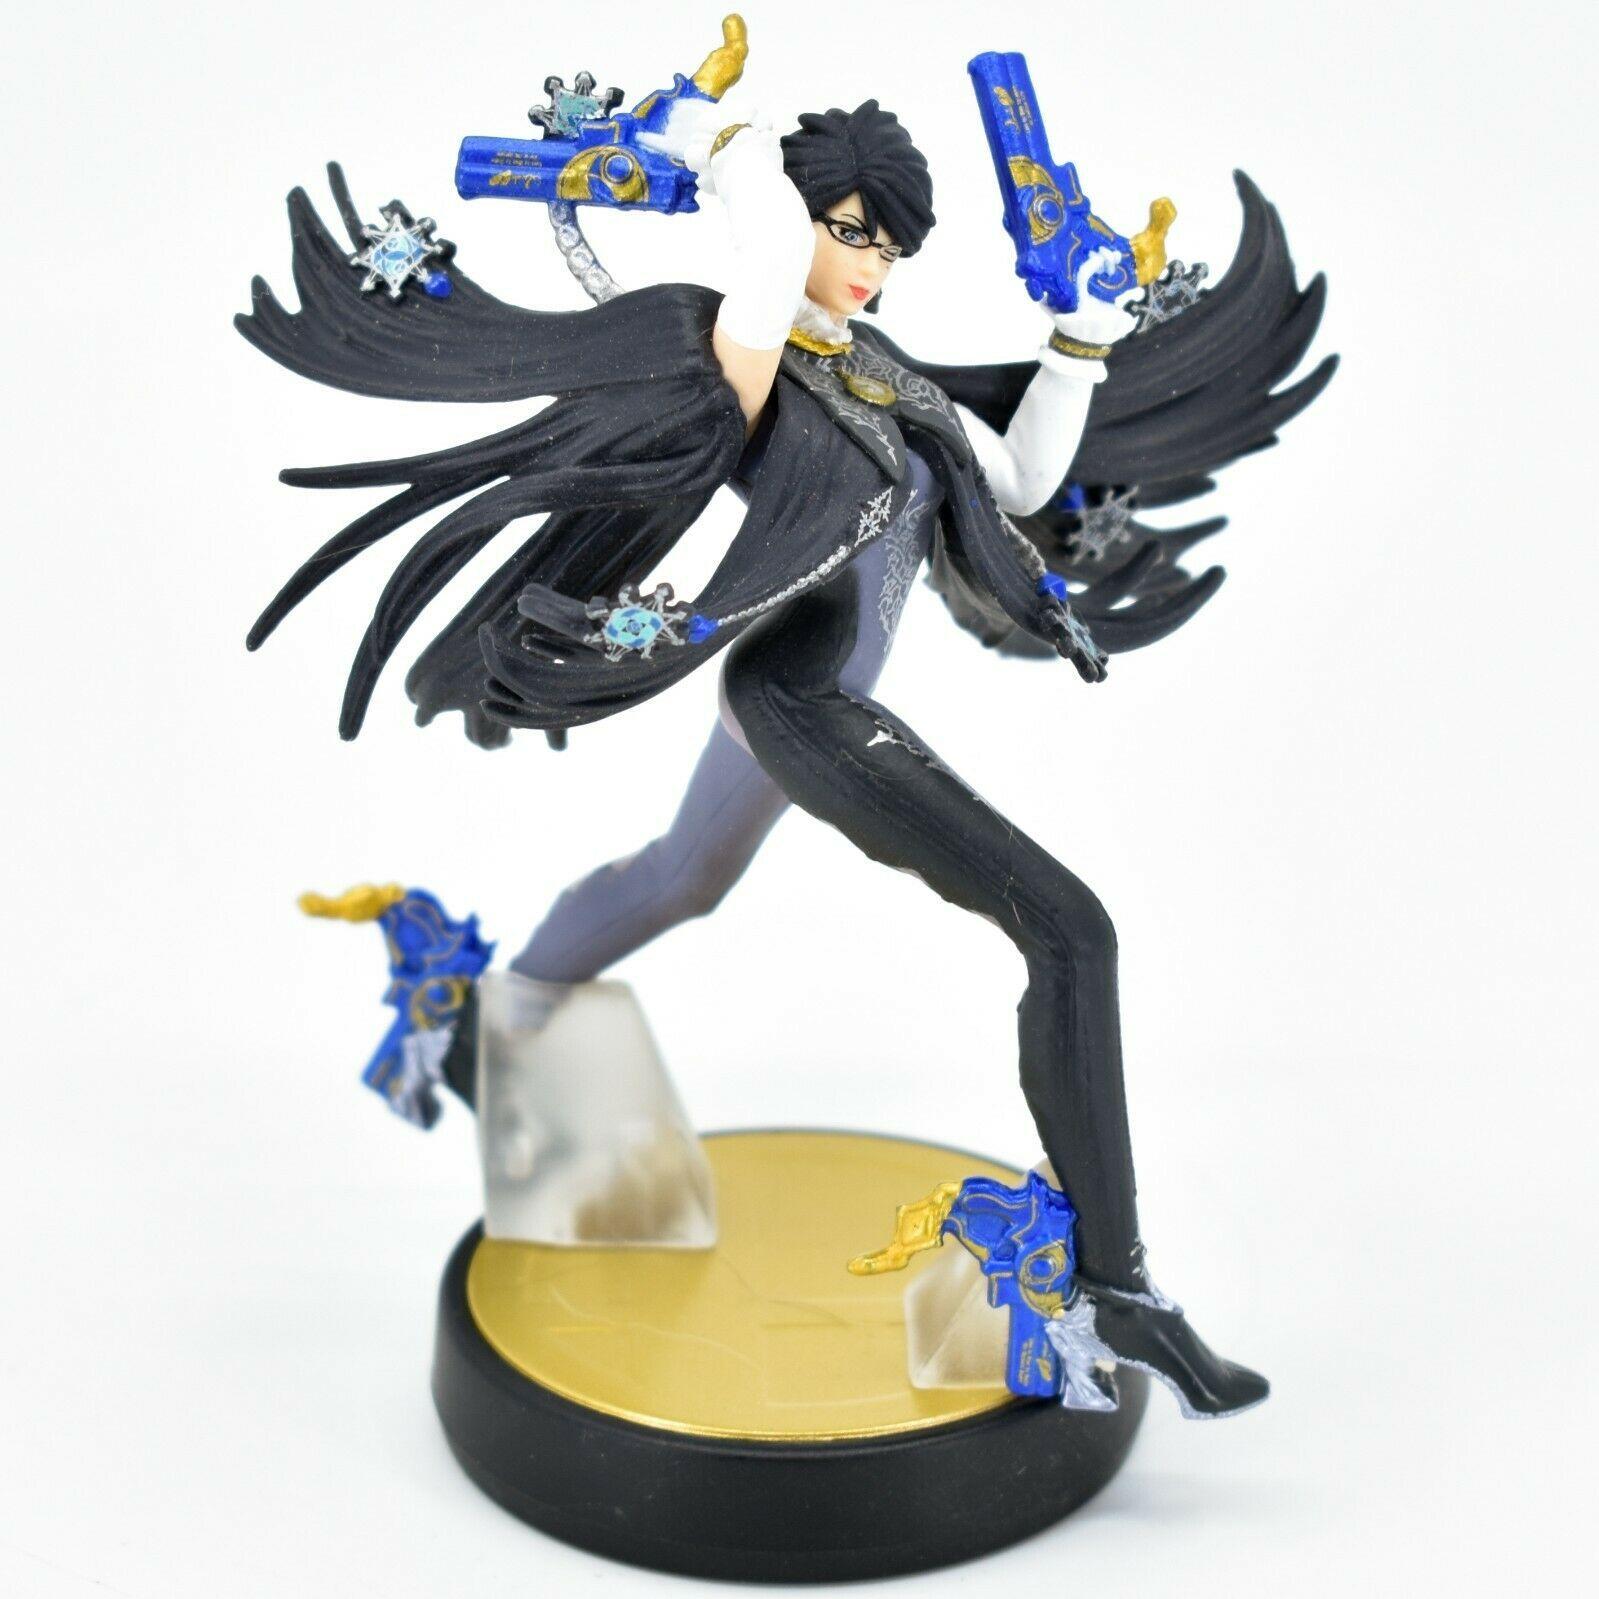 Nintendo Super Smash Bros. Bayonetta Player 1 Amiibo Loose Character Figure